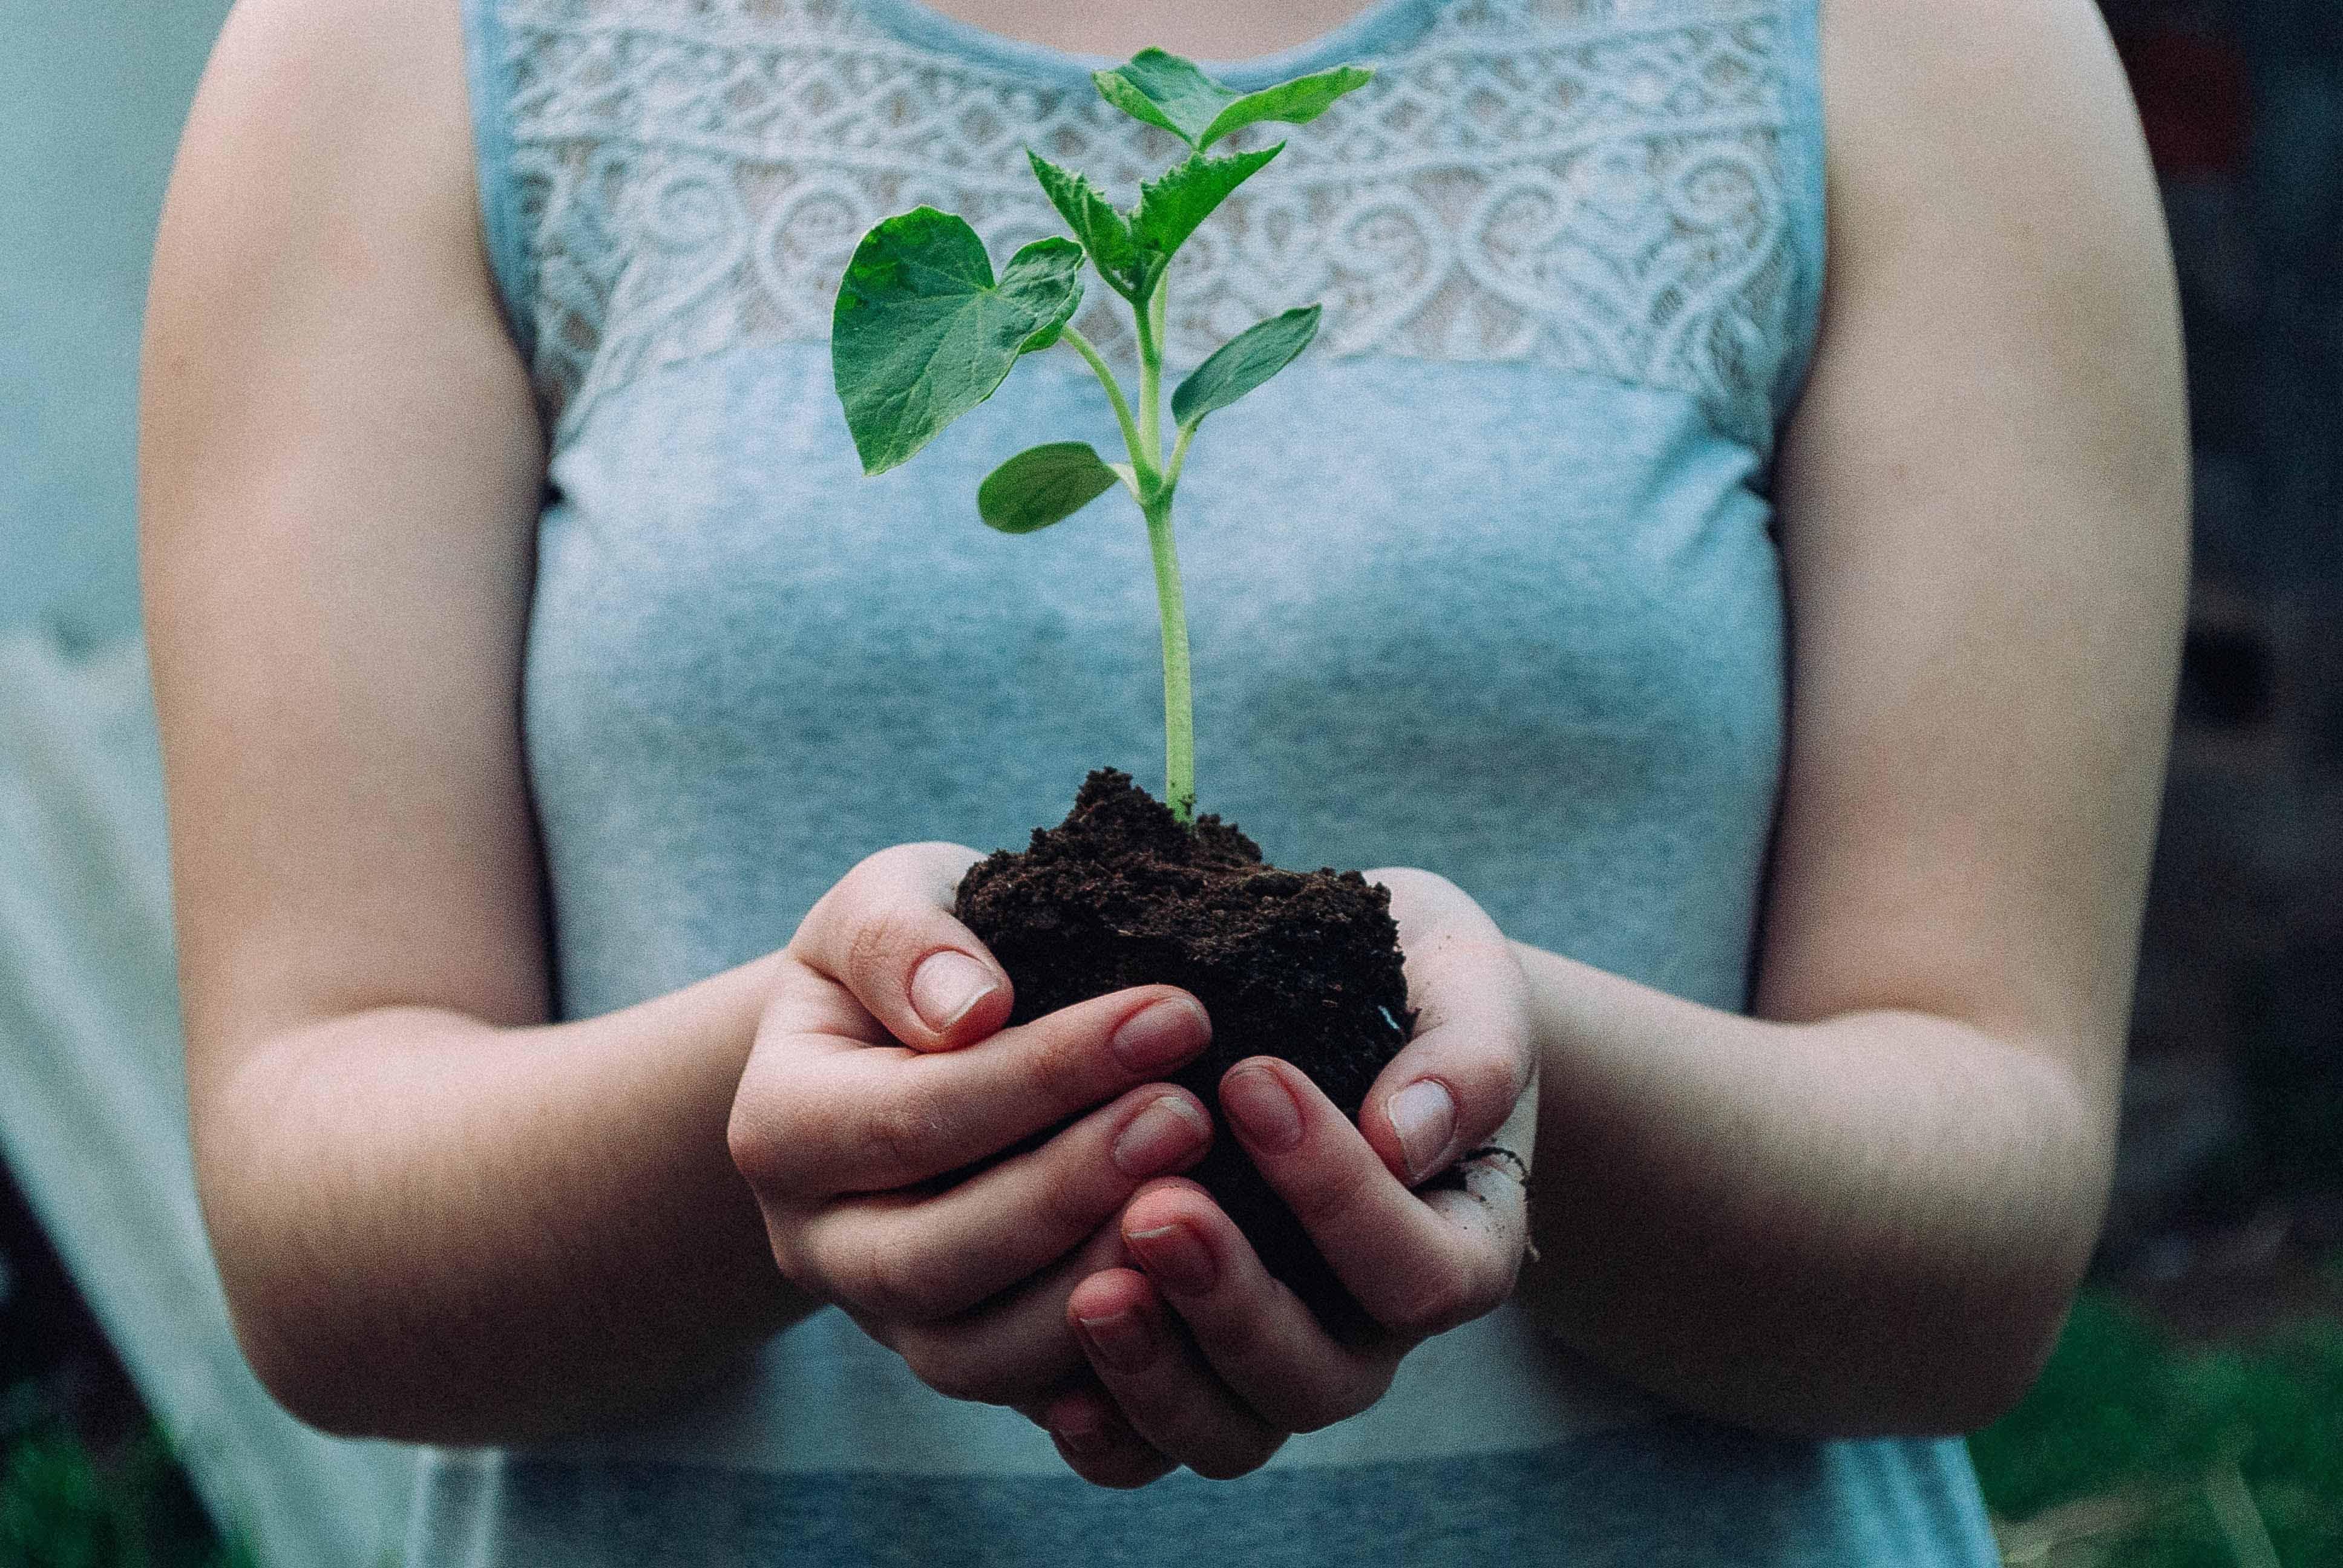 chung tay trồng rừng